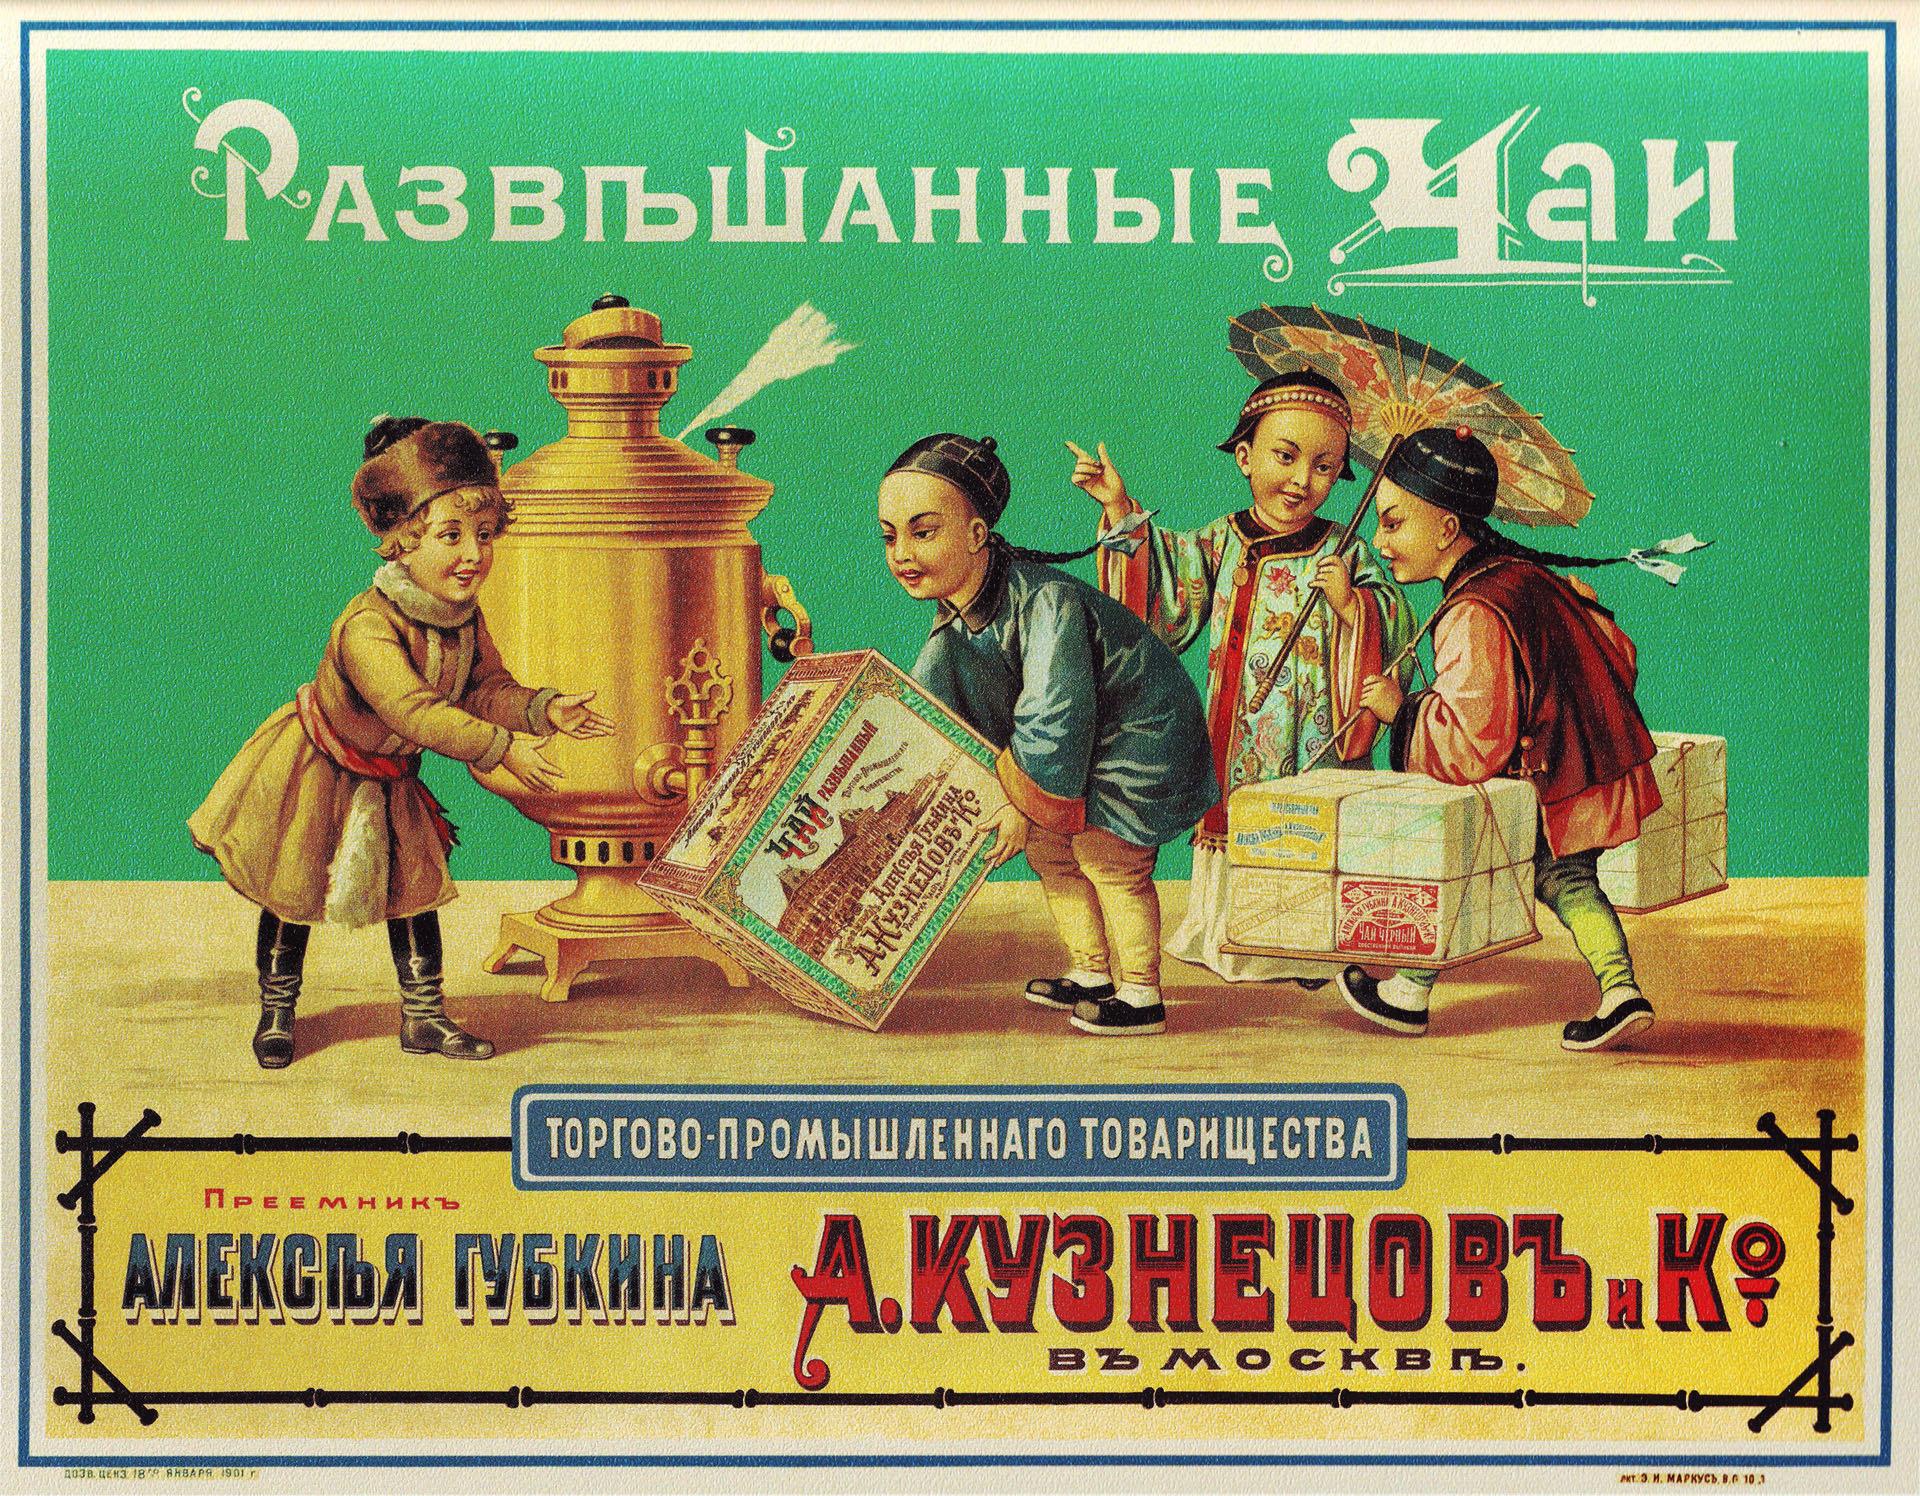 https://www.tea-terra.ru/wp-content/uploads/2013/07/2013_07_22_08_011.jpg